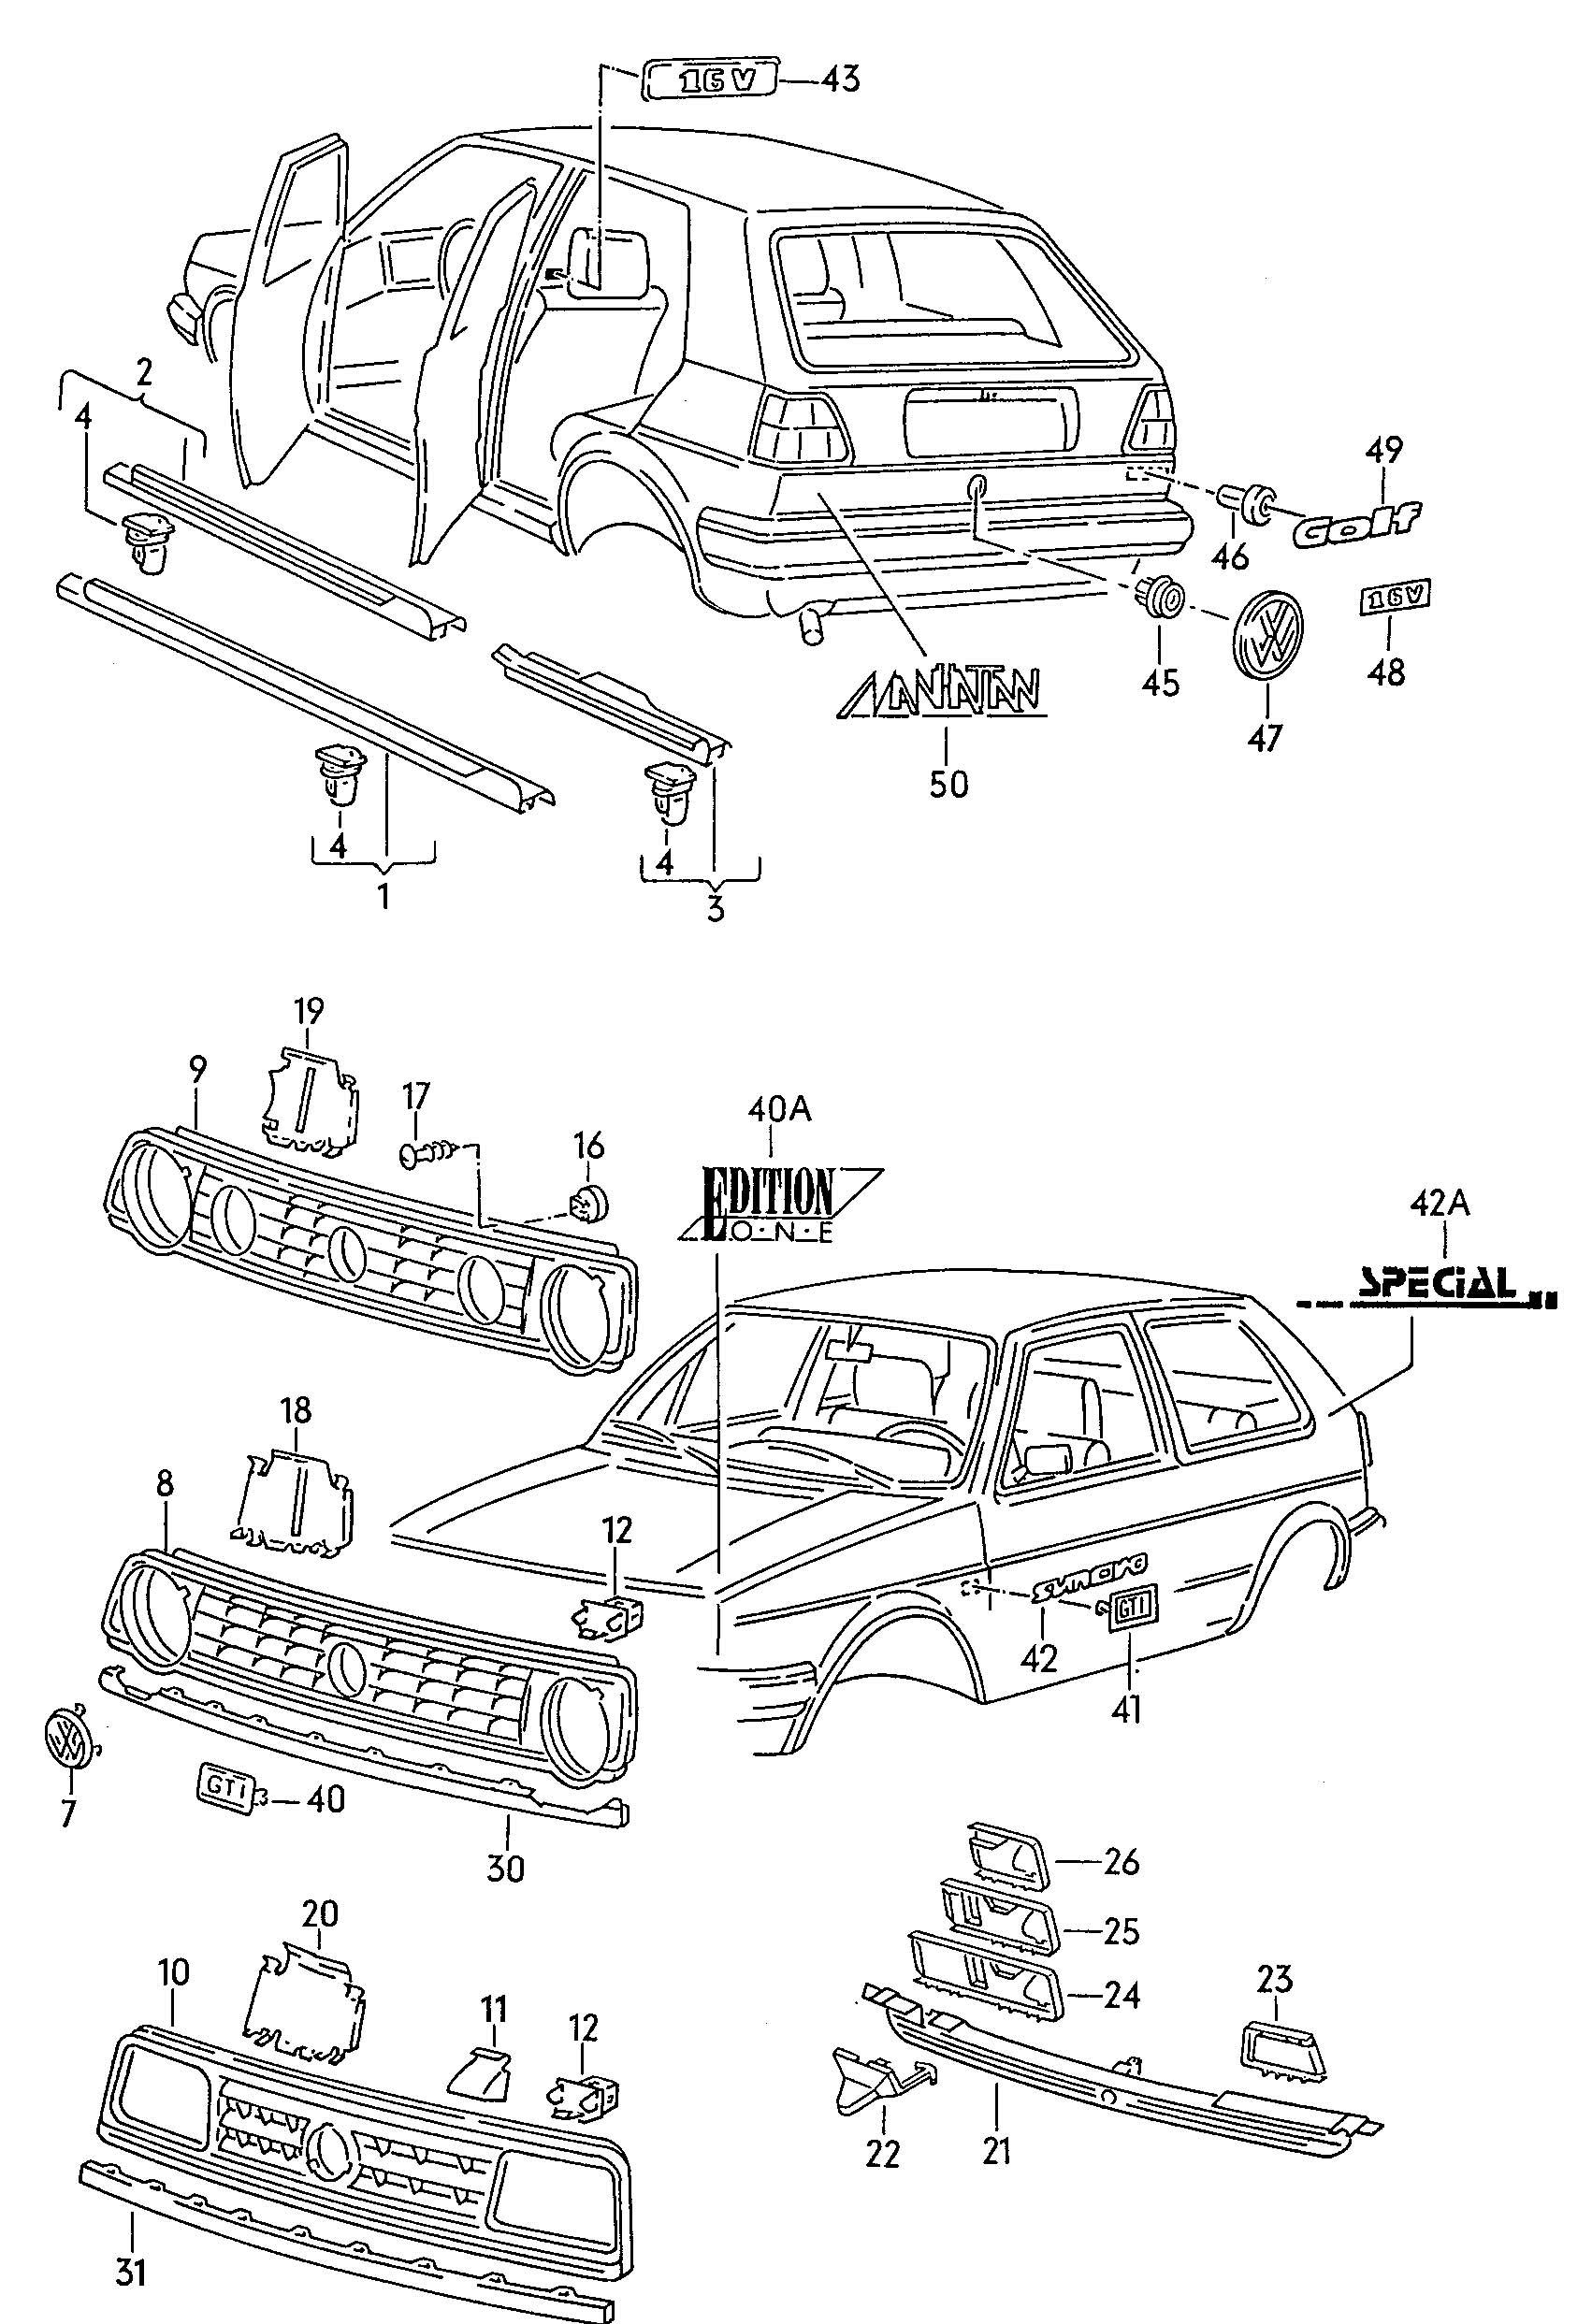 Vw Bug Rear Radiator, Vw, Free Engine Image For User